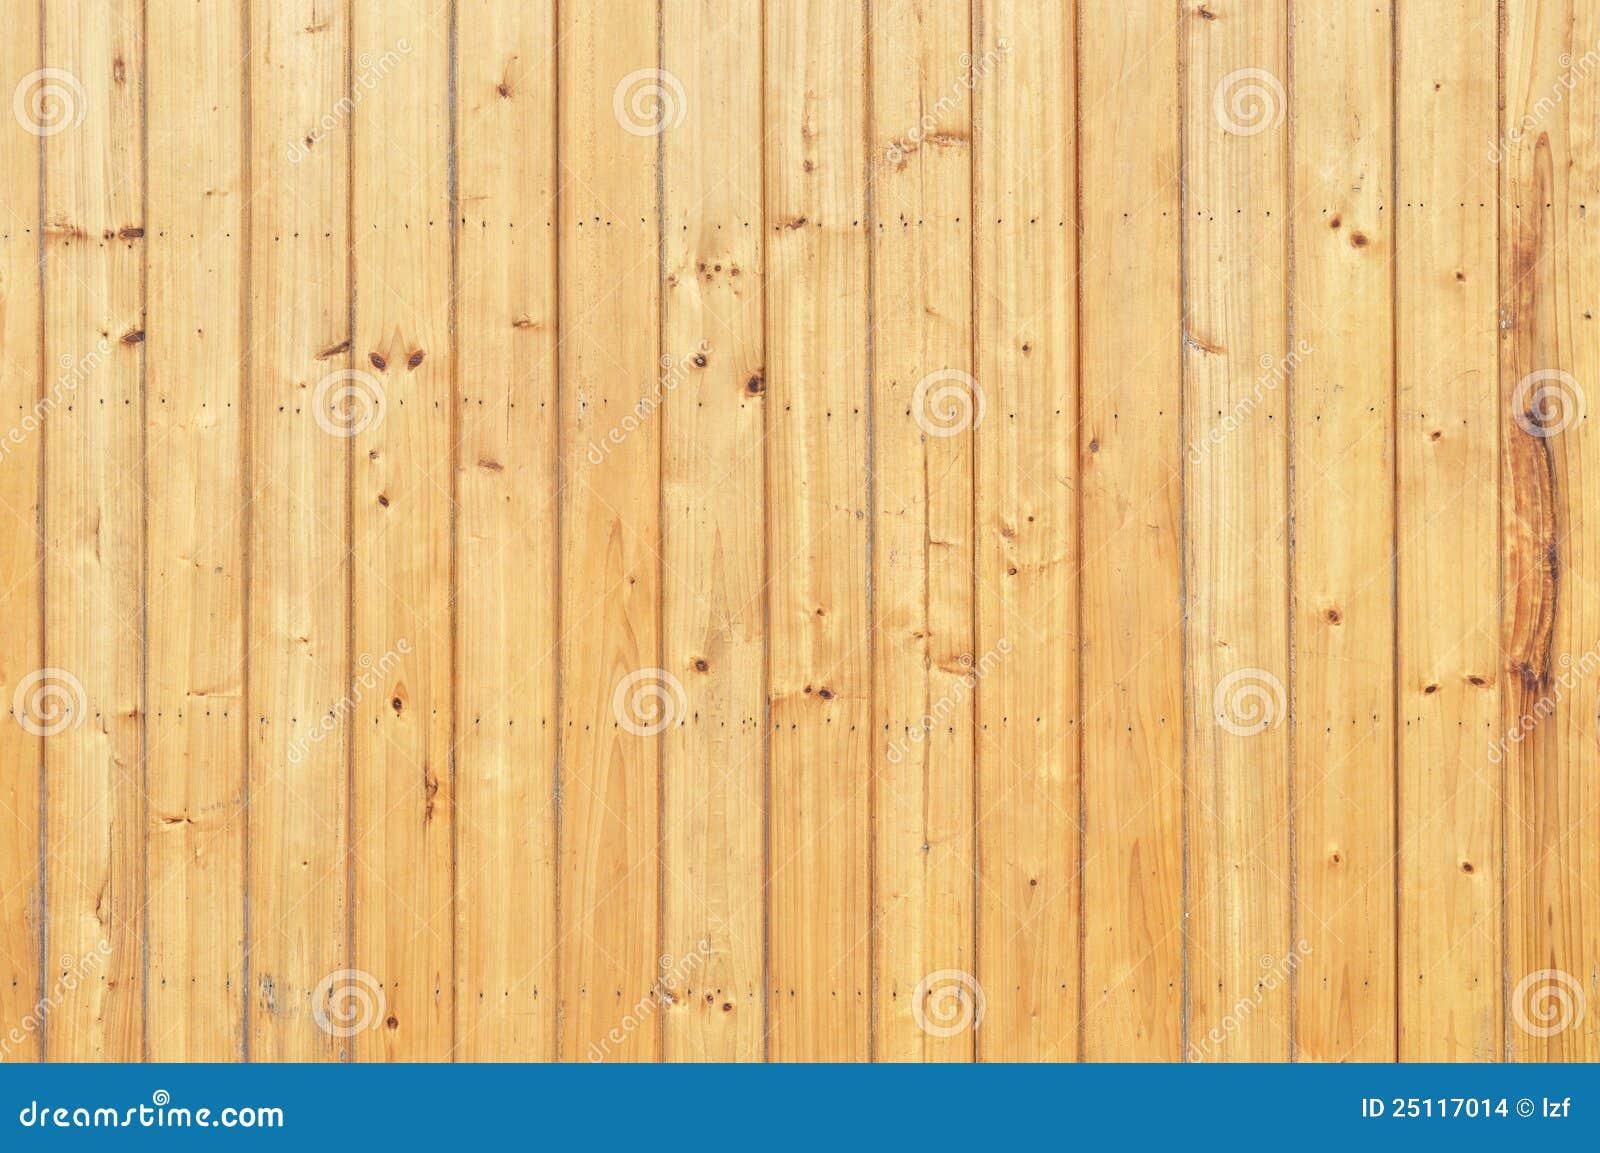 Wood Panel: Old Wood Panel Walls